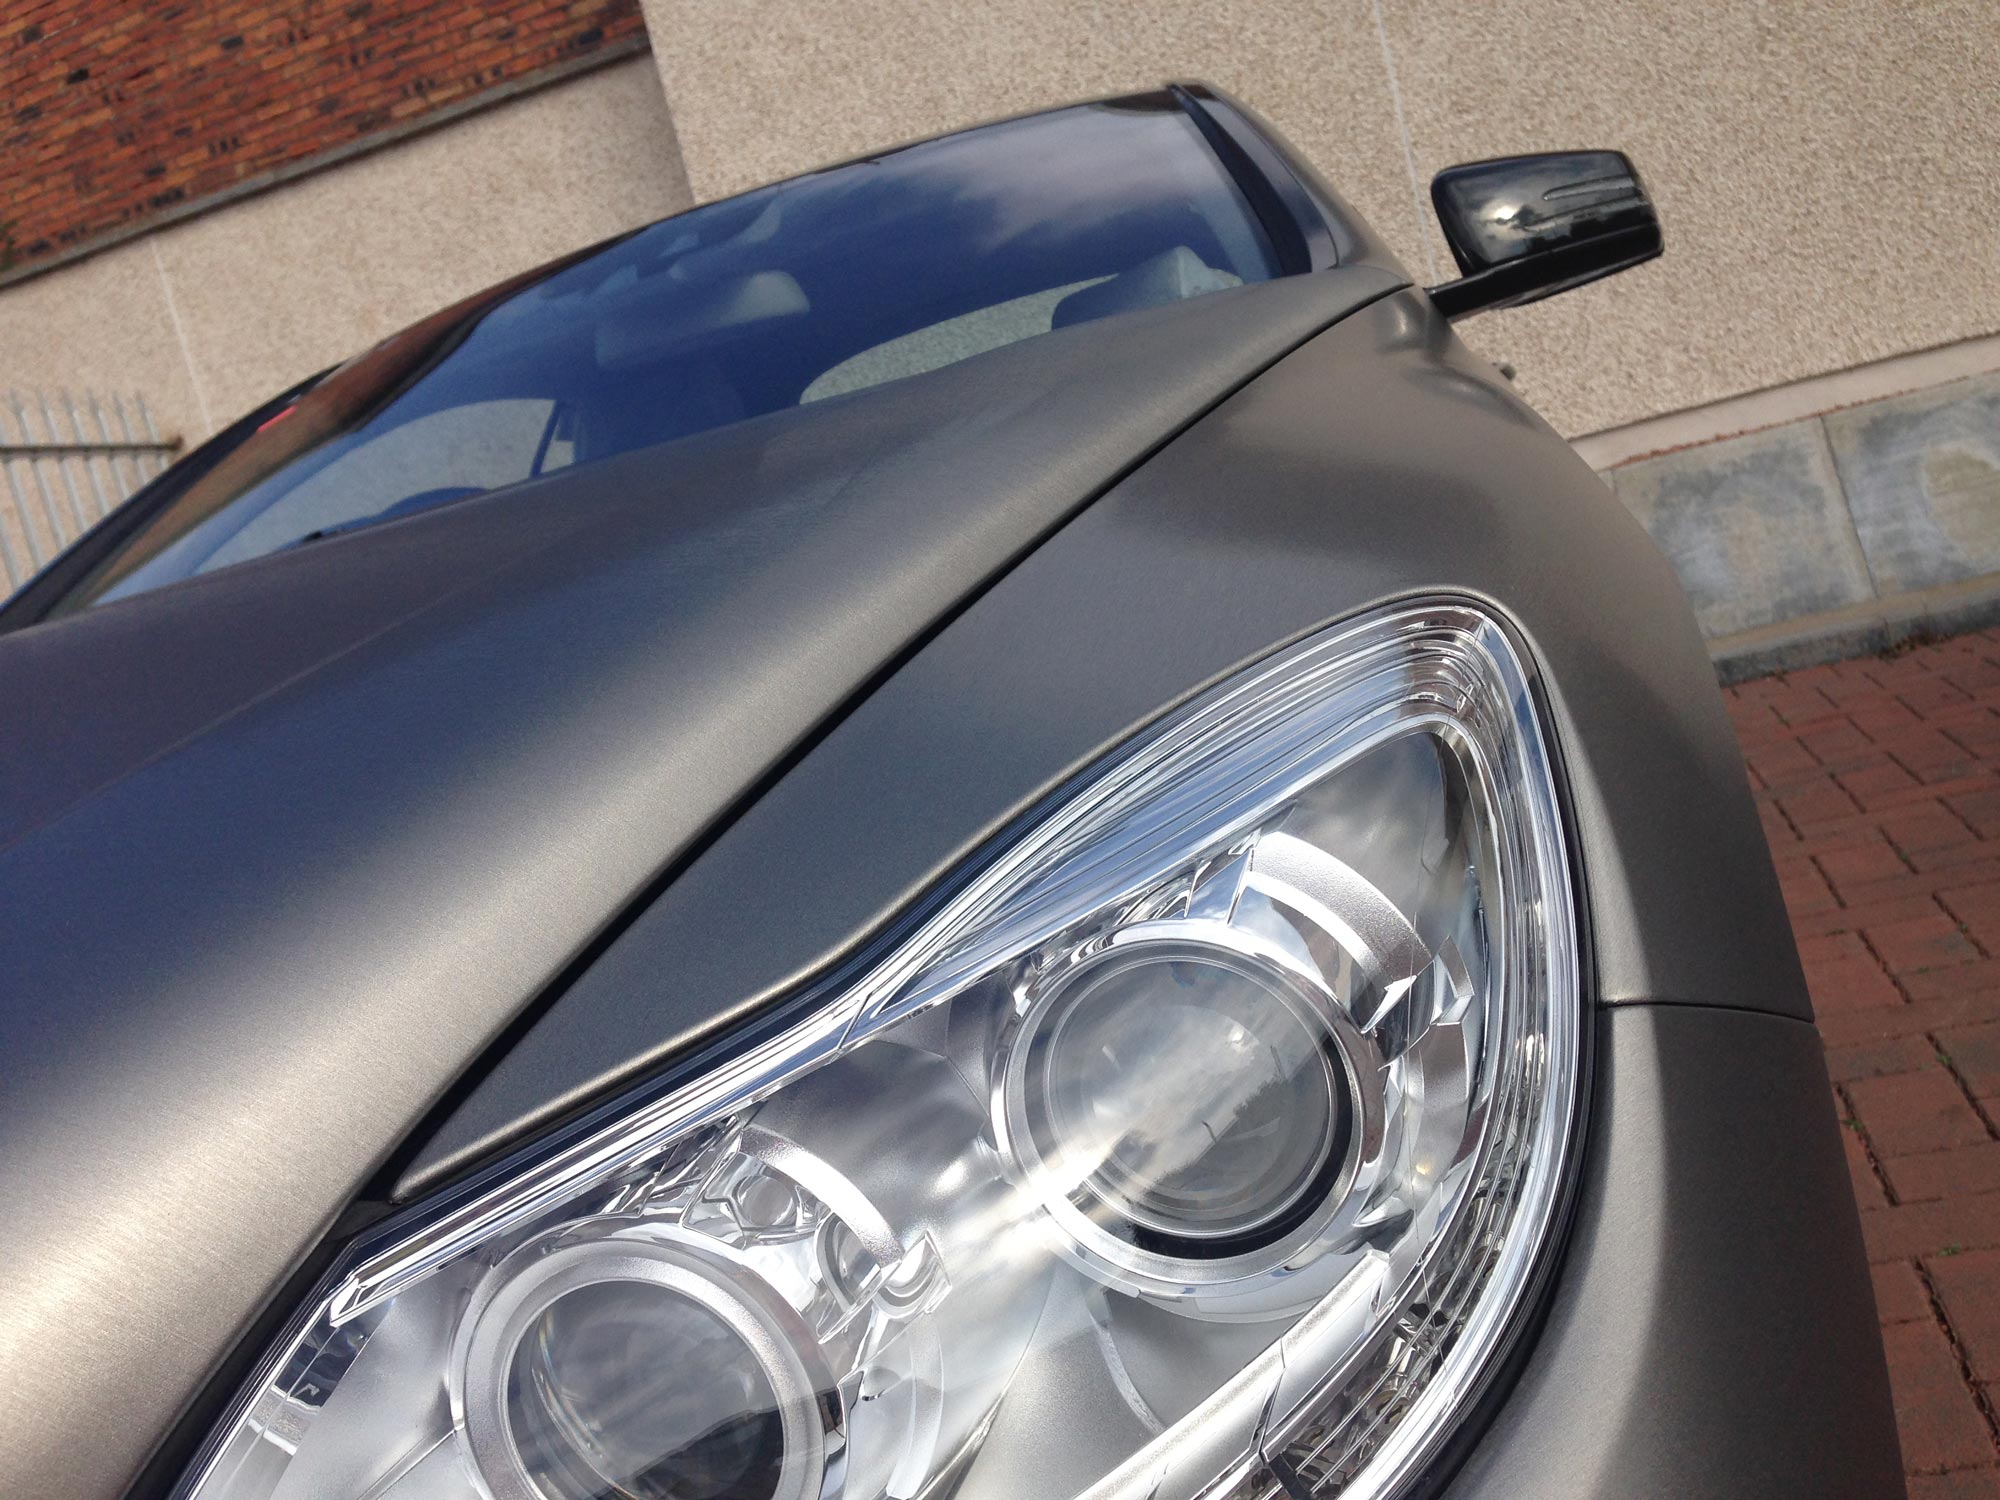 3M Brushed Titanium Vinyl wrapped Mercedes CL Coupe